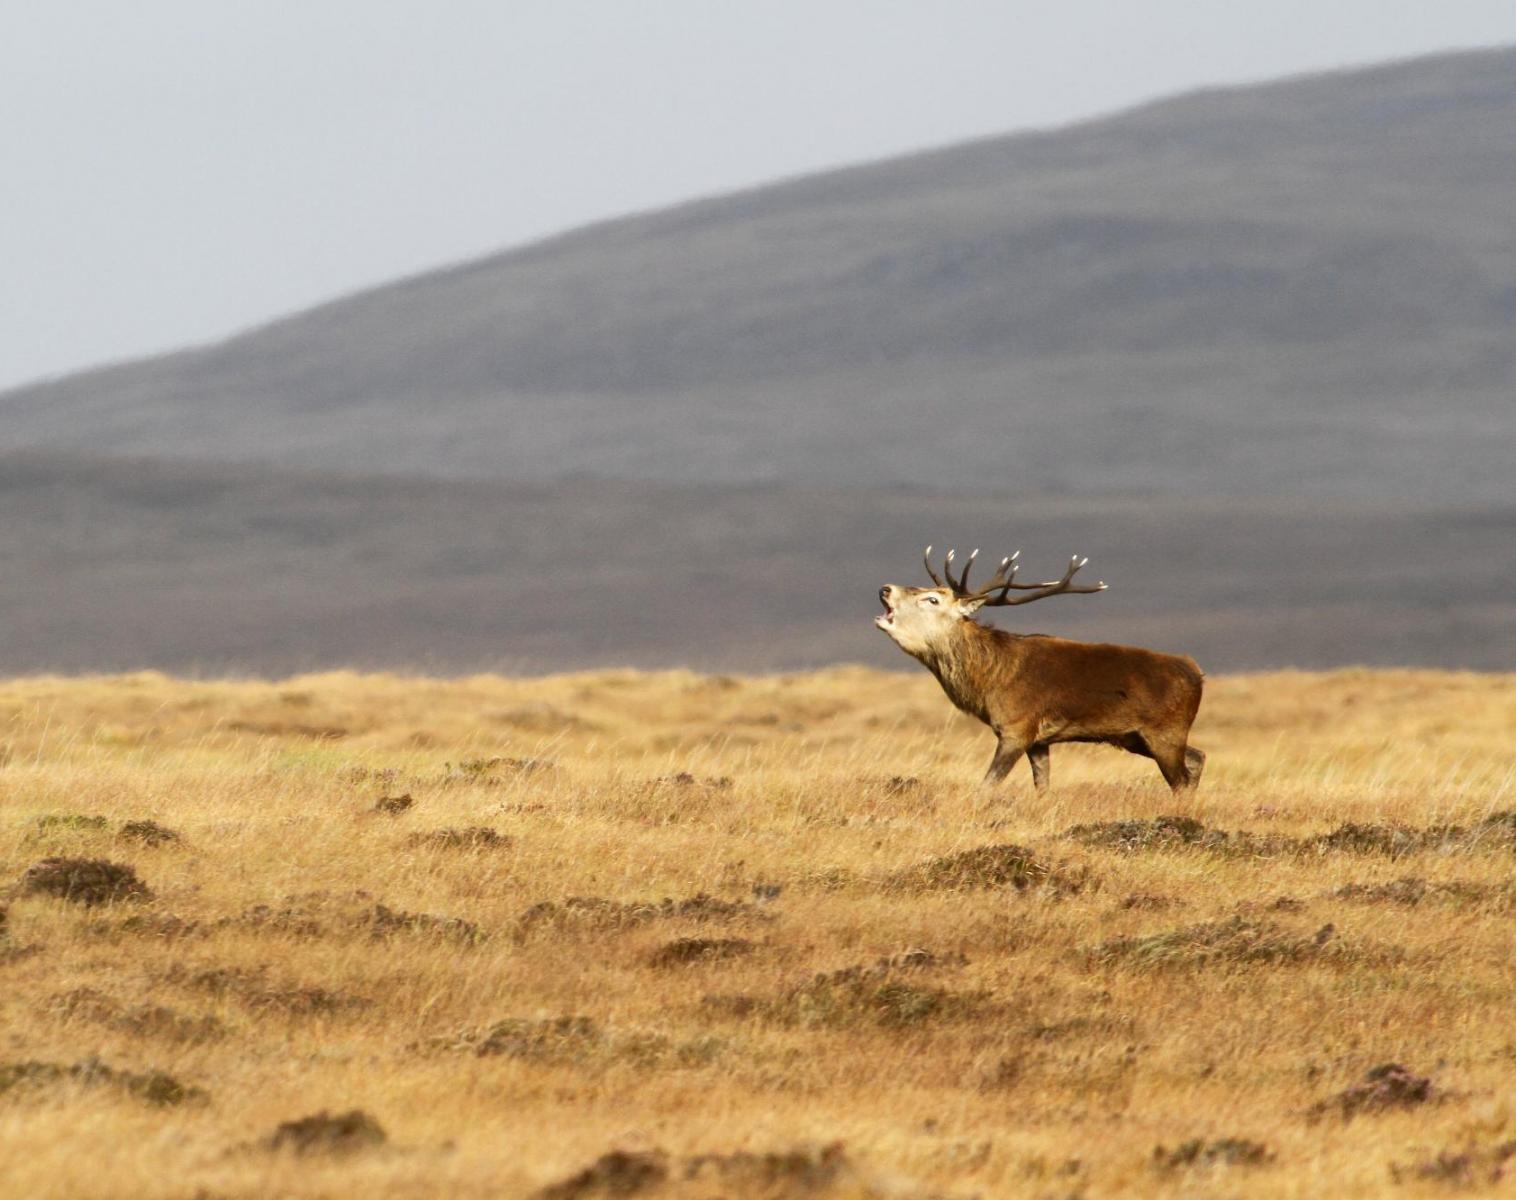 Écosse  Brame du cerf et migrations des oies   Photo Observation nature Balade nature